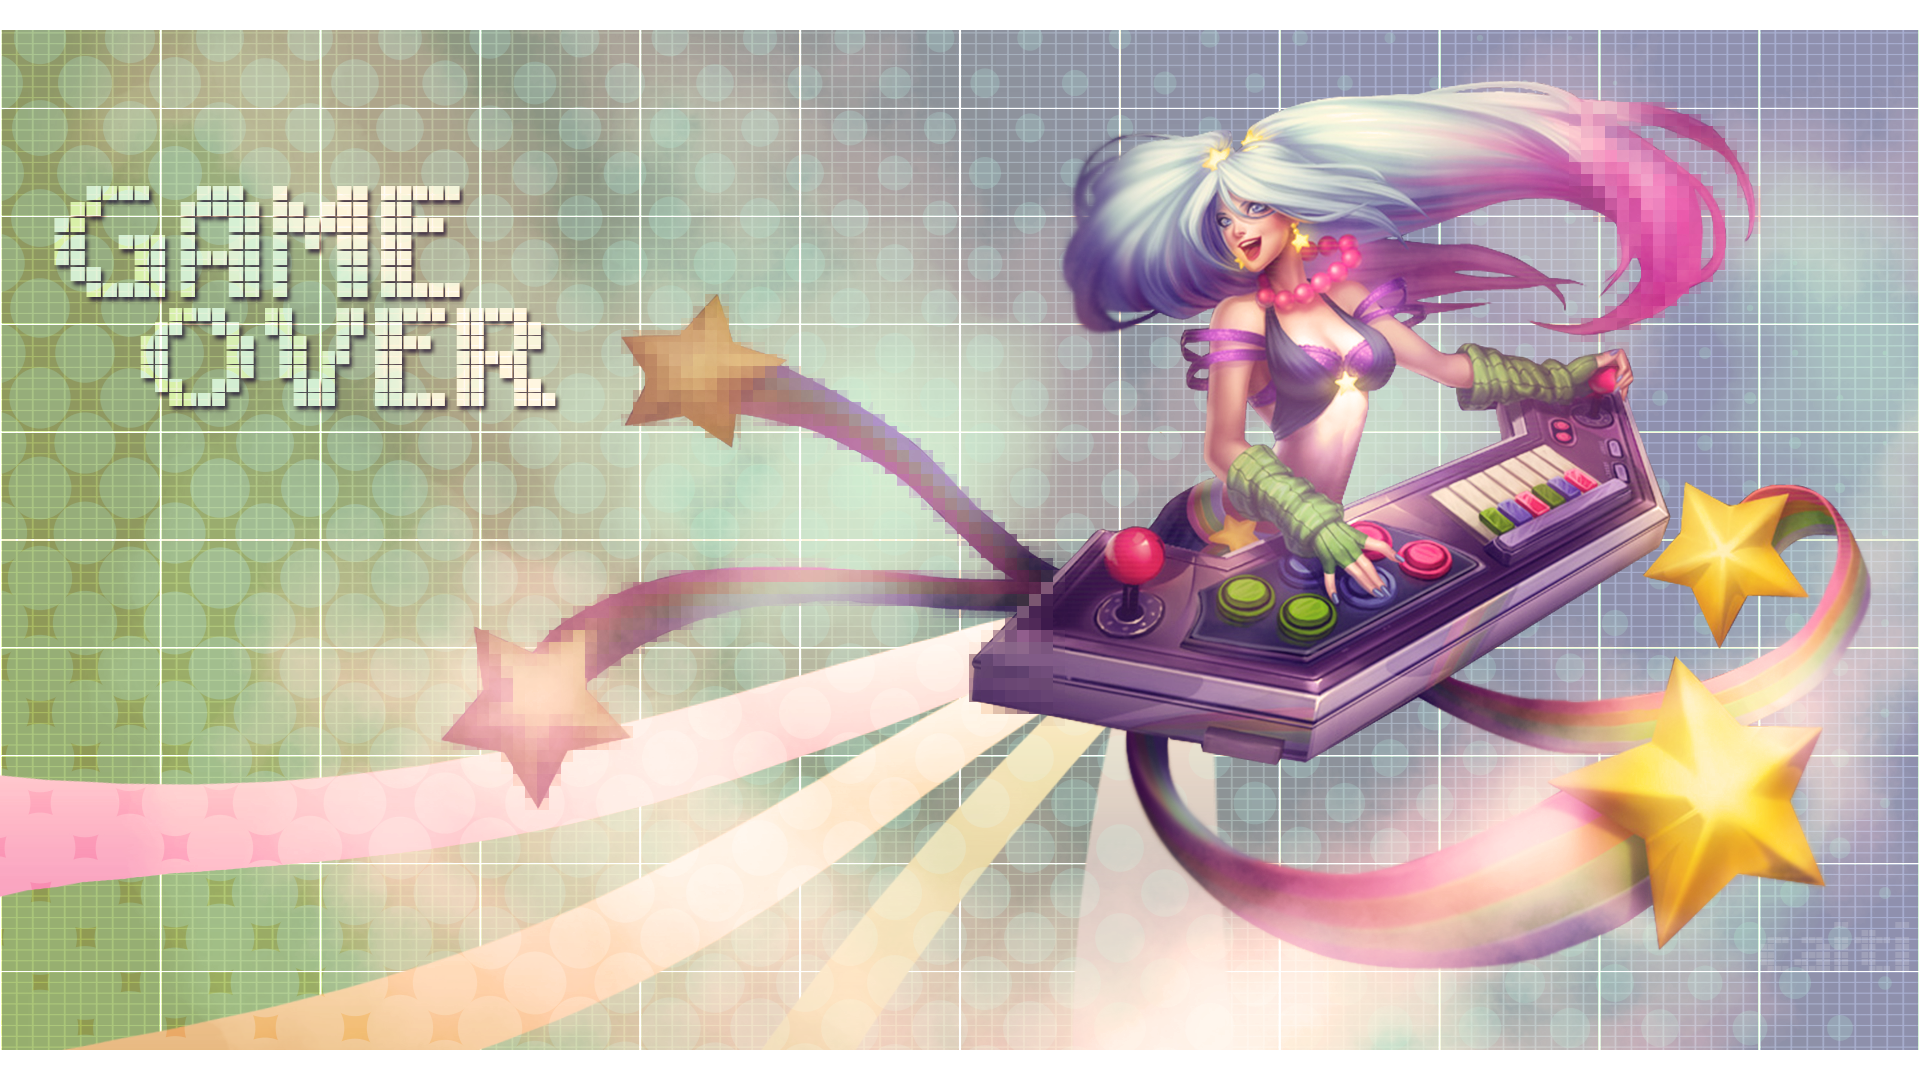 Arcade Battle Fan Art - League of Legends Wallpapers  Arcade Sona Wallpaper